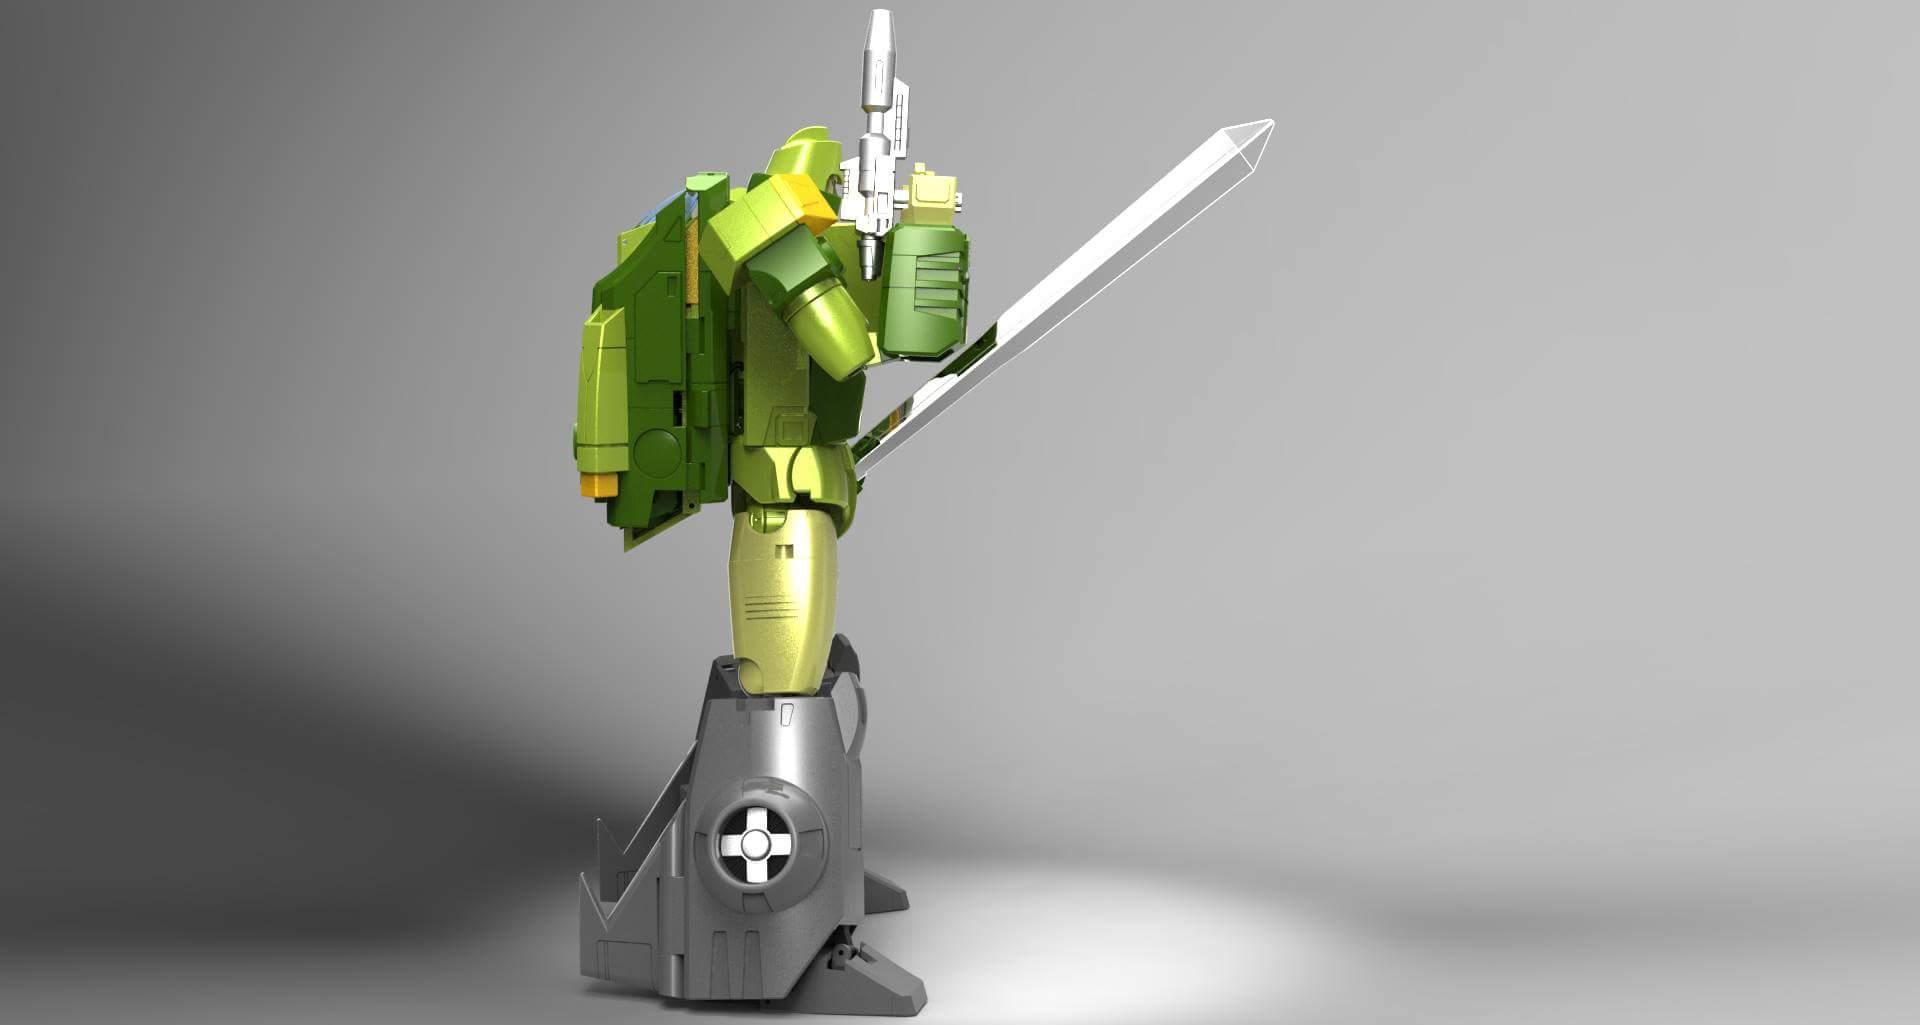 [X-Transbots] Produit Tiers - Jouets MX-10 Virtus - aka Springer/Ricochet L3G50GCY